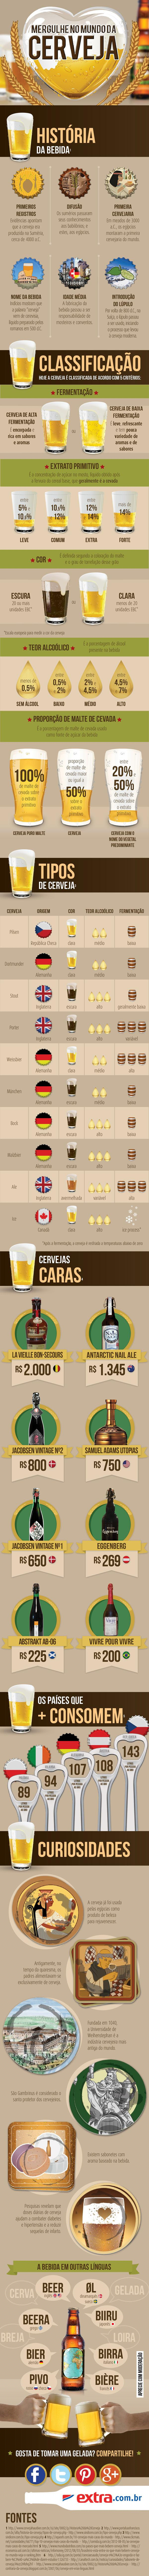 historia-da-cerveja-infografico